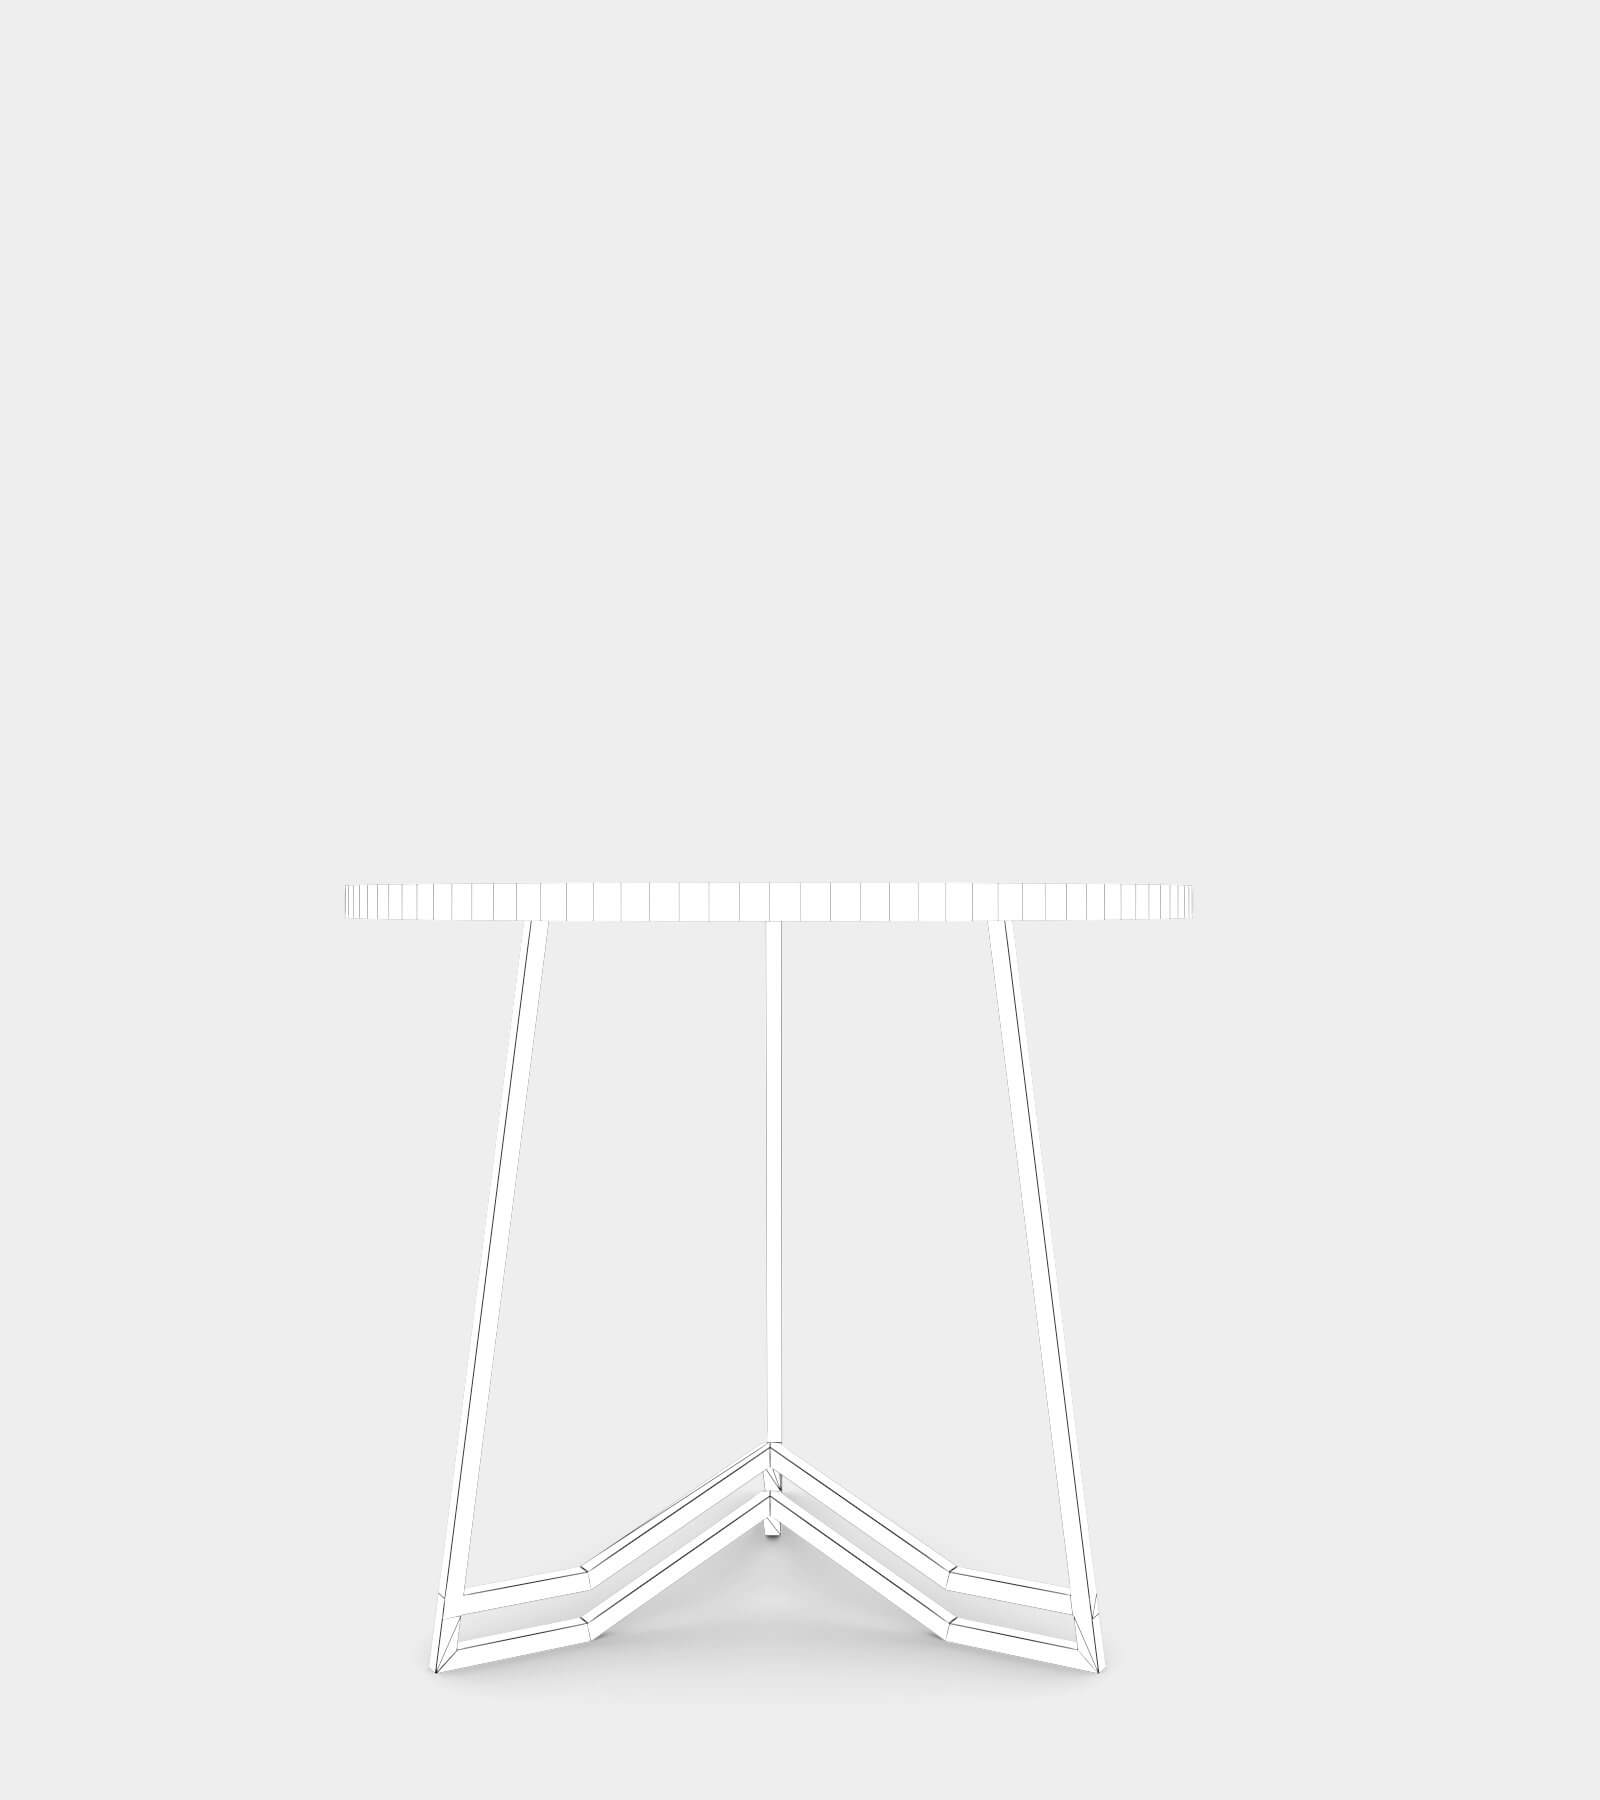 Bronze side table-wire-2 3D Model